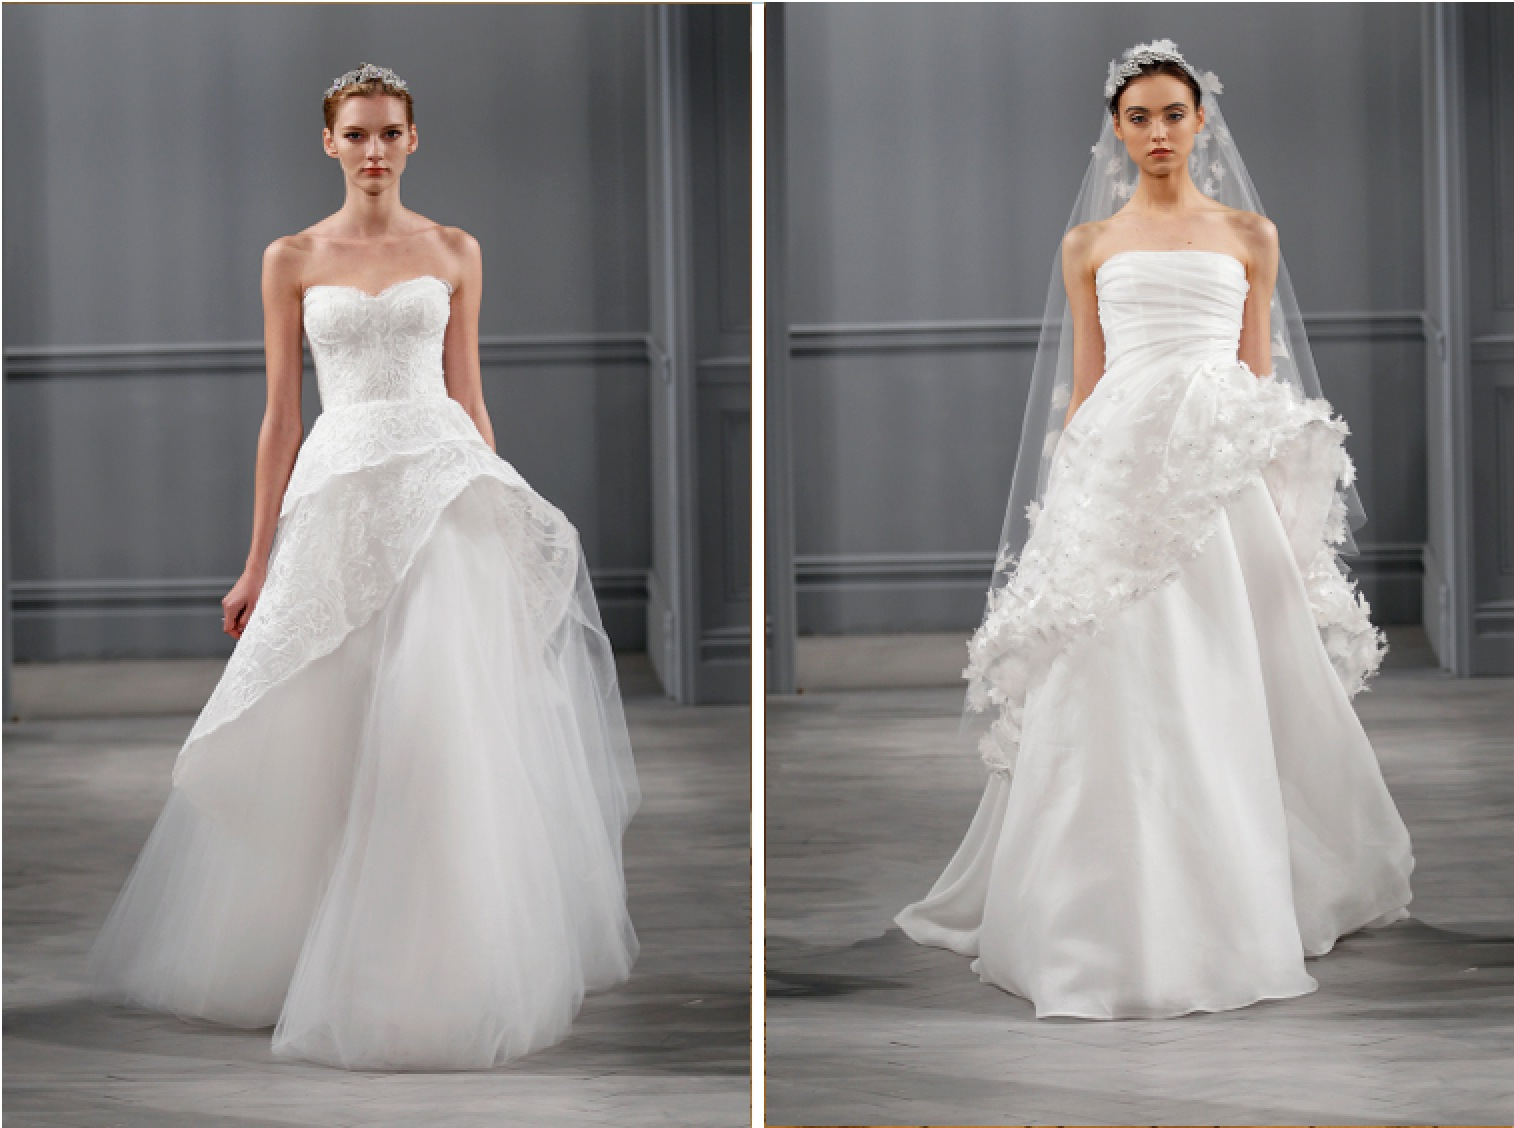 Wedding Dresses, A-line Wedding Dresses, Romantic Wedding Dresses, Fashion, Modern Weddings, Strapless Wedding Dresses, Monique lhuillier